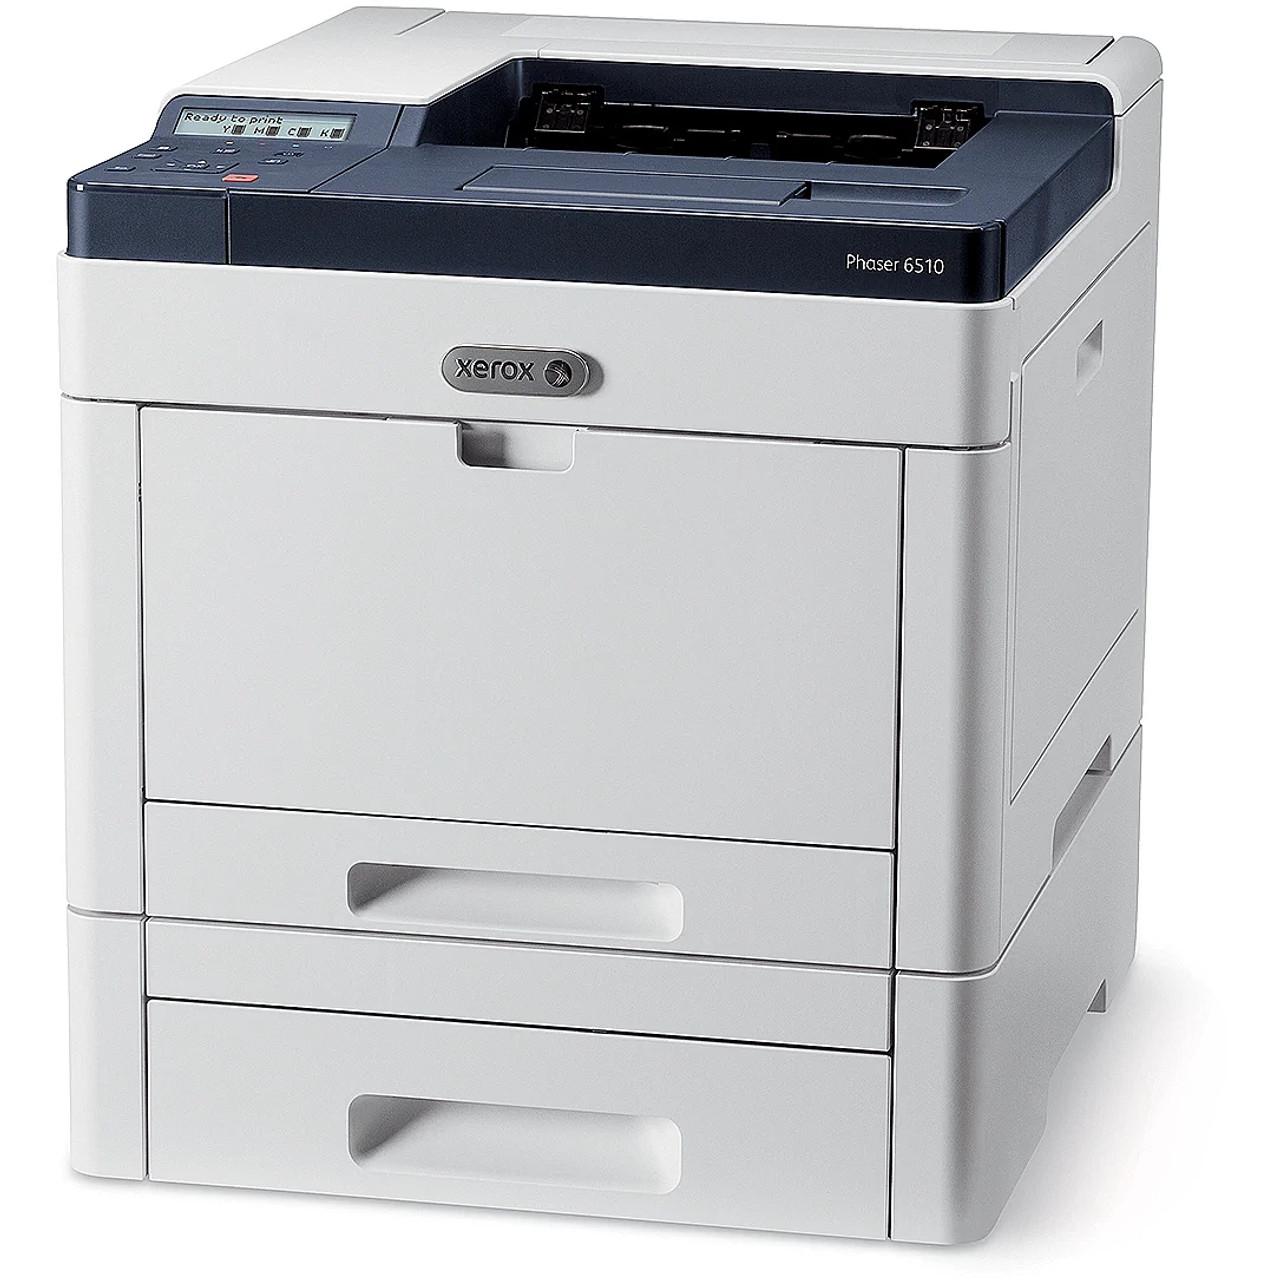 Xerox 6510 with optional tray